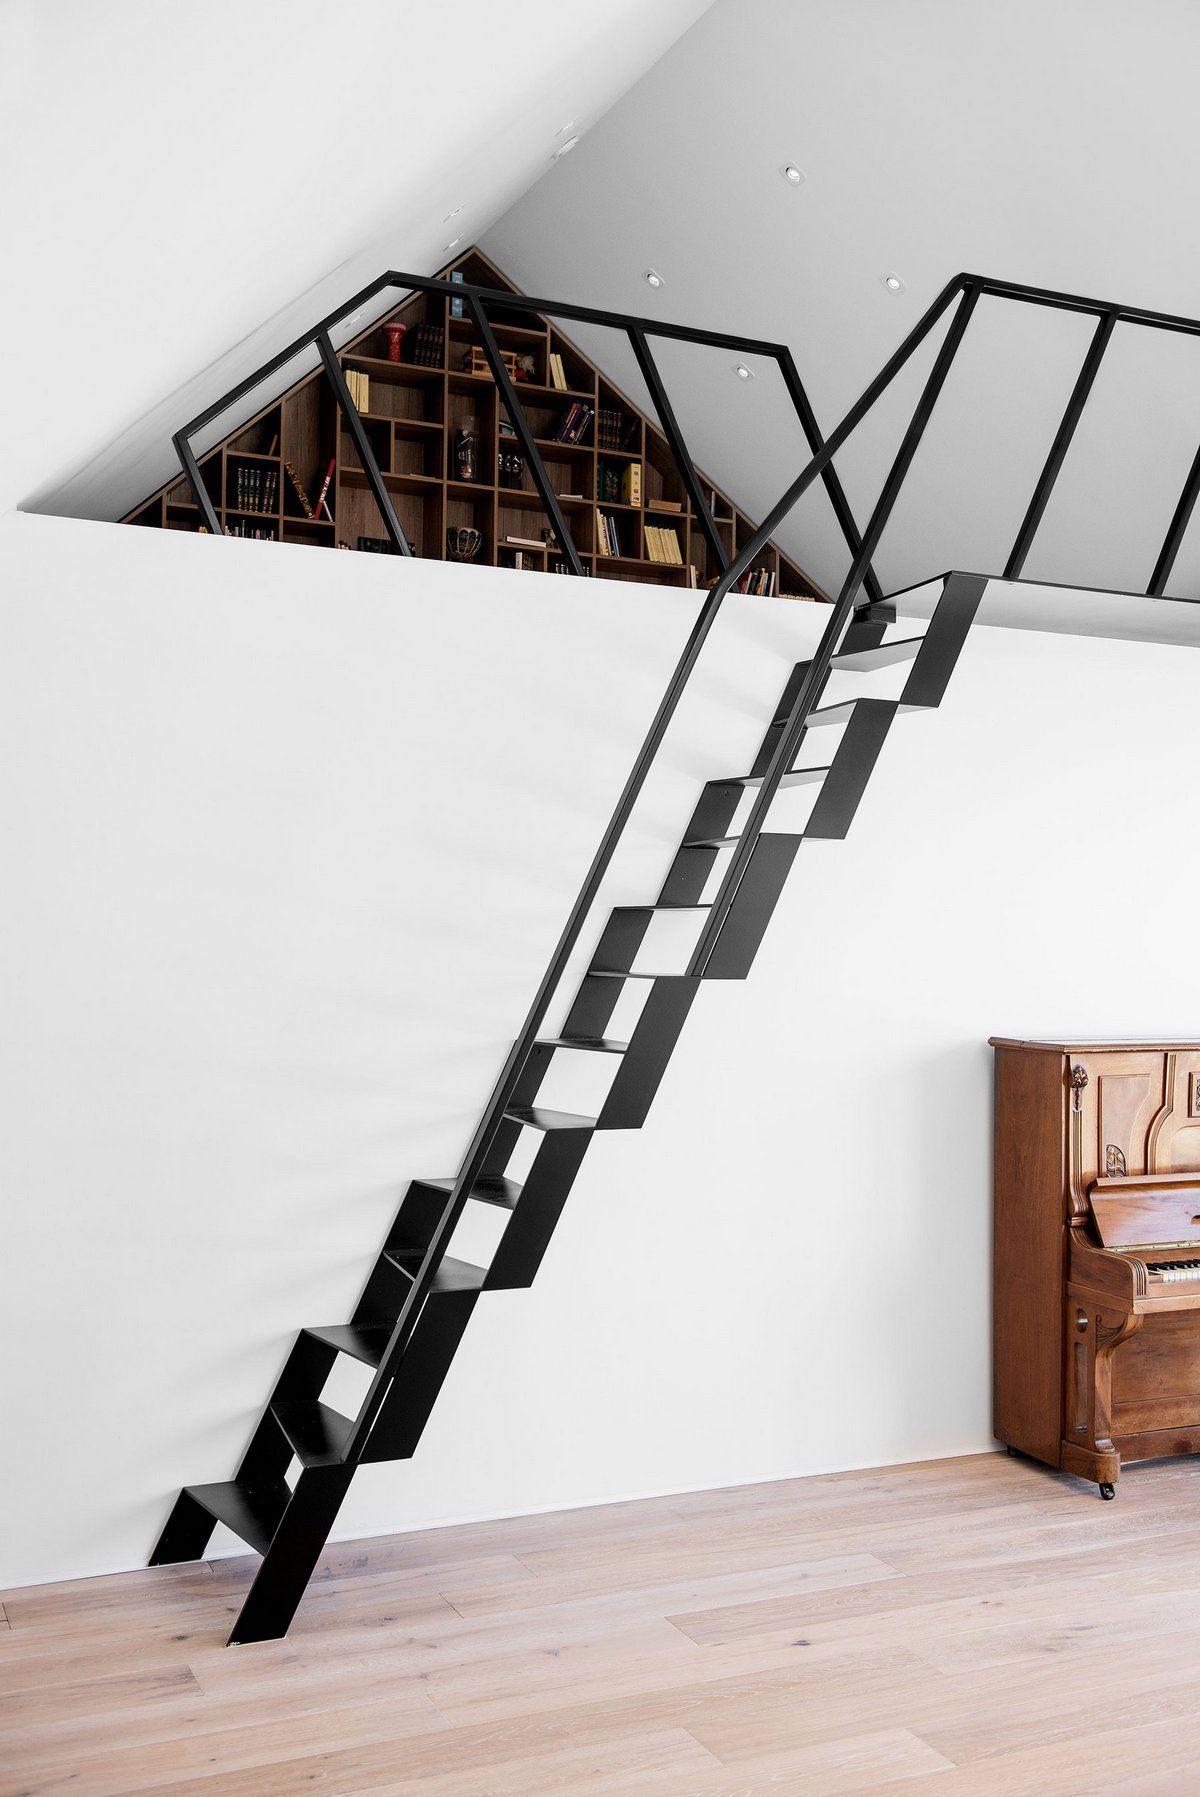 Семейная резиденция в Словении | Staircases, Architecture and Interiors